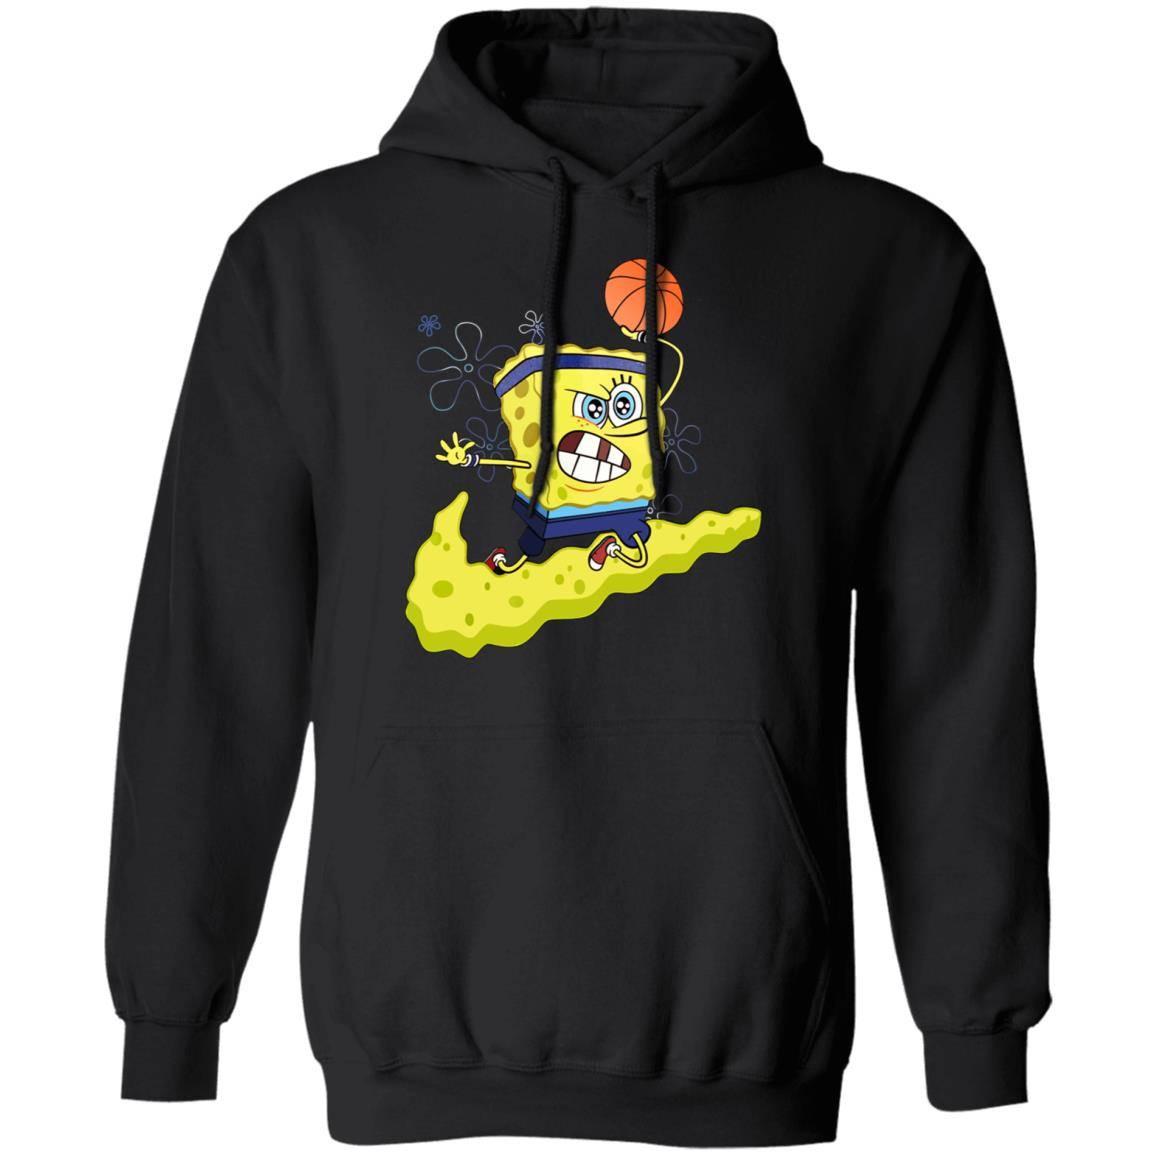 Kyrie IrvingBasketball Spongebob – Hoodie for Men, Women